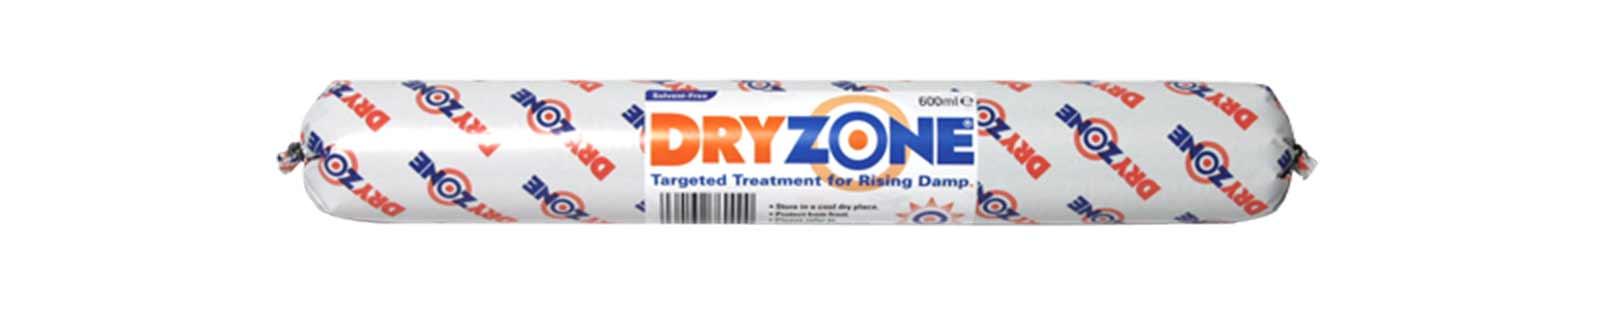 Dryzone